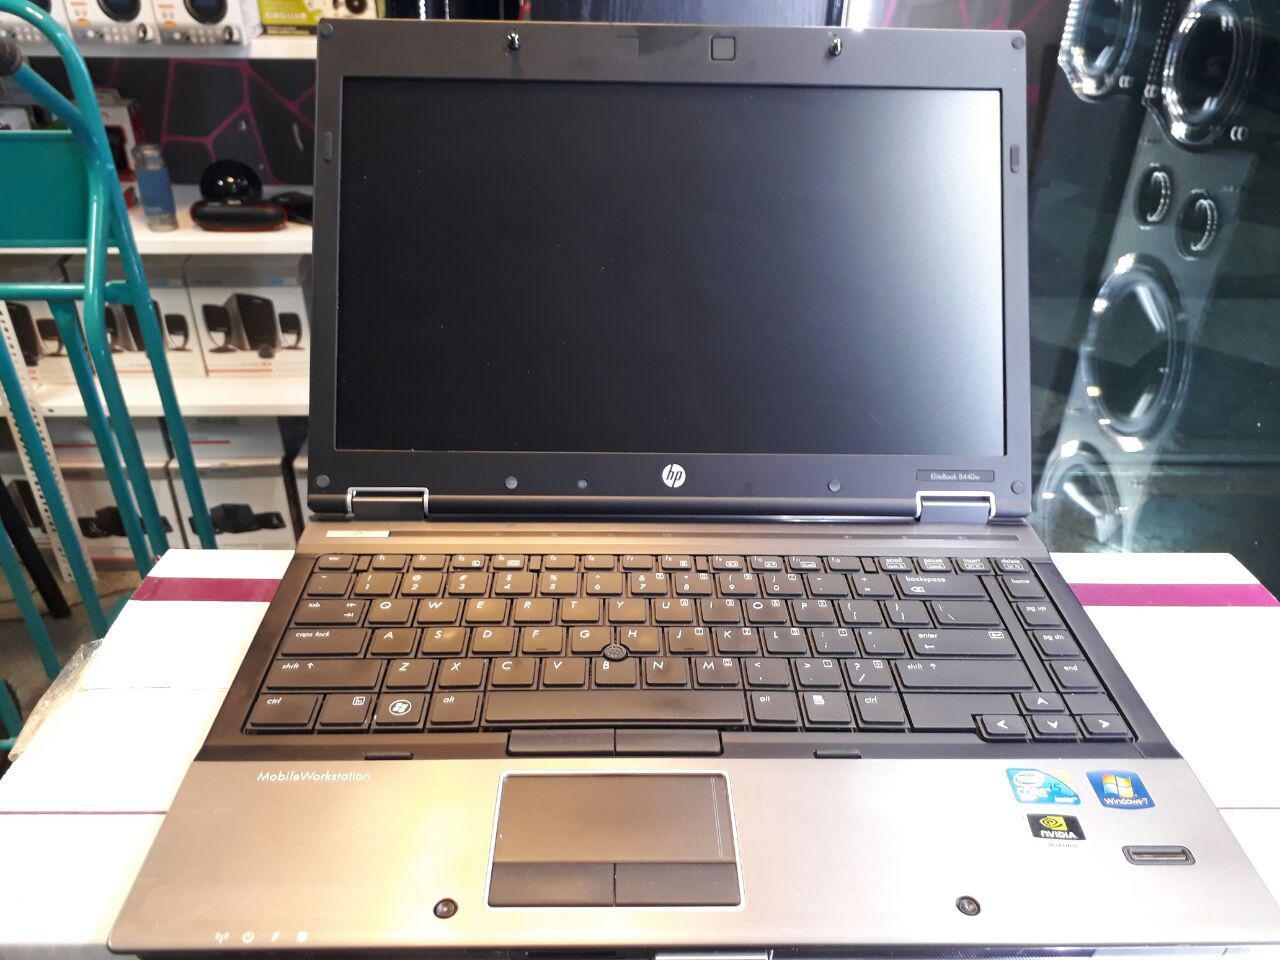 لپ تاپ استوک اچ پی hp 8440w